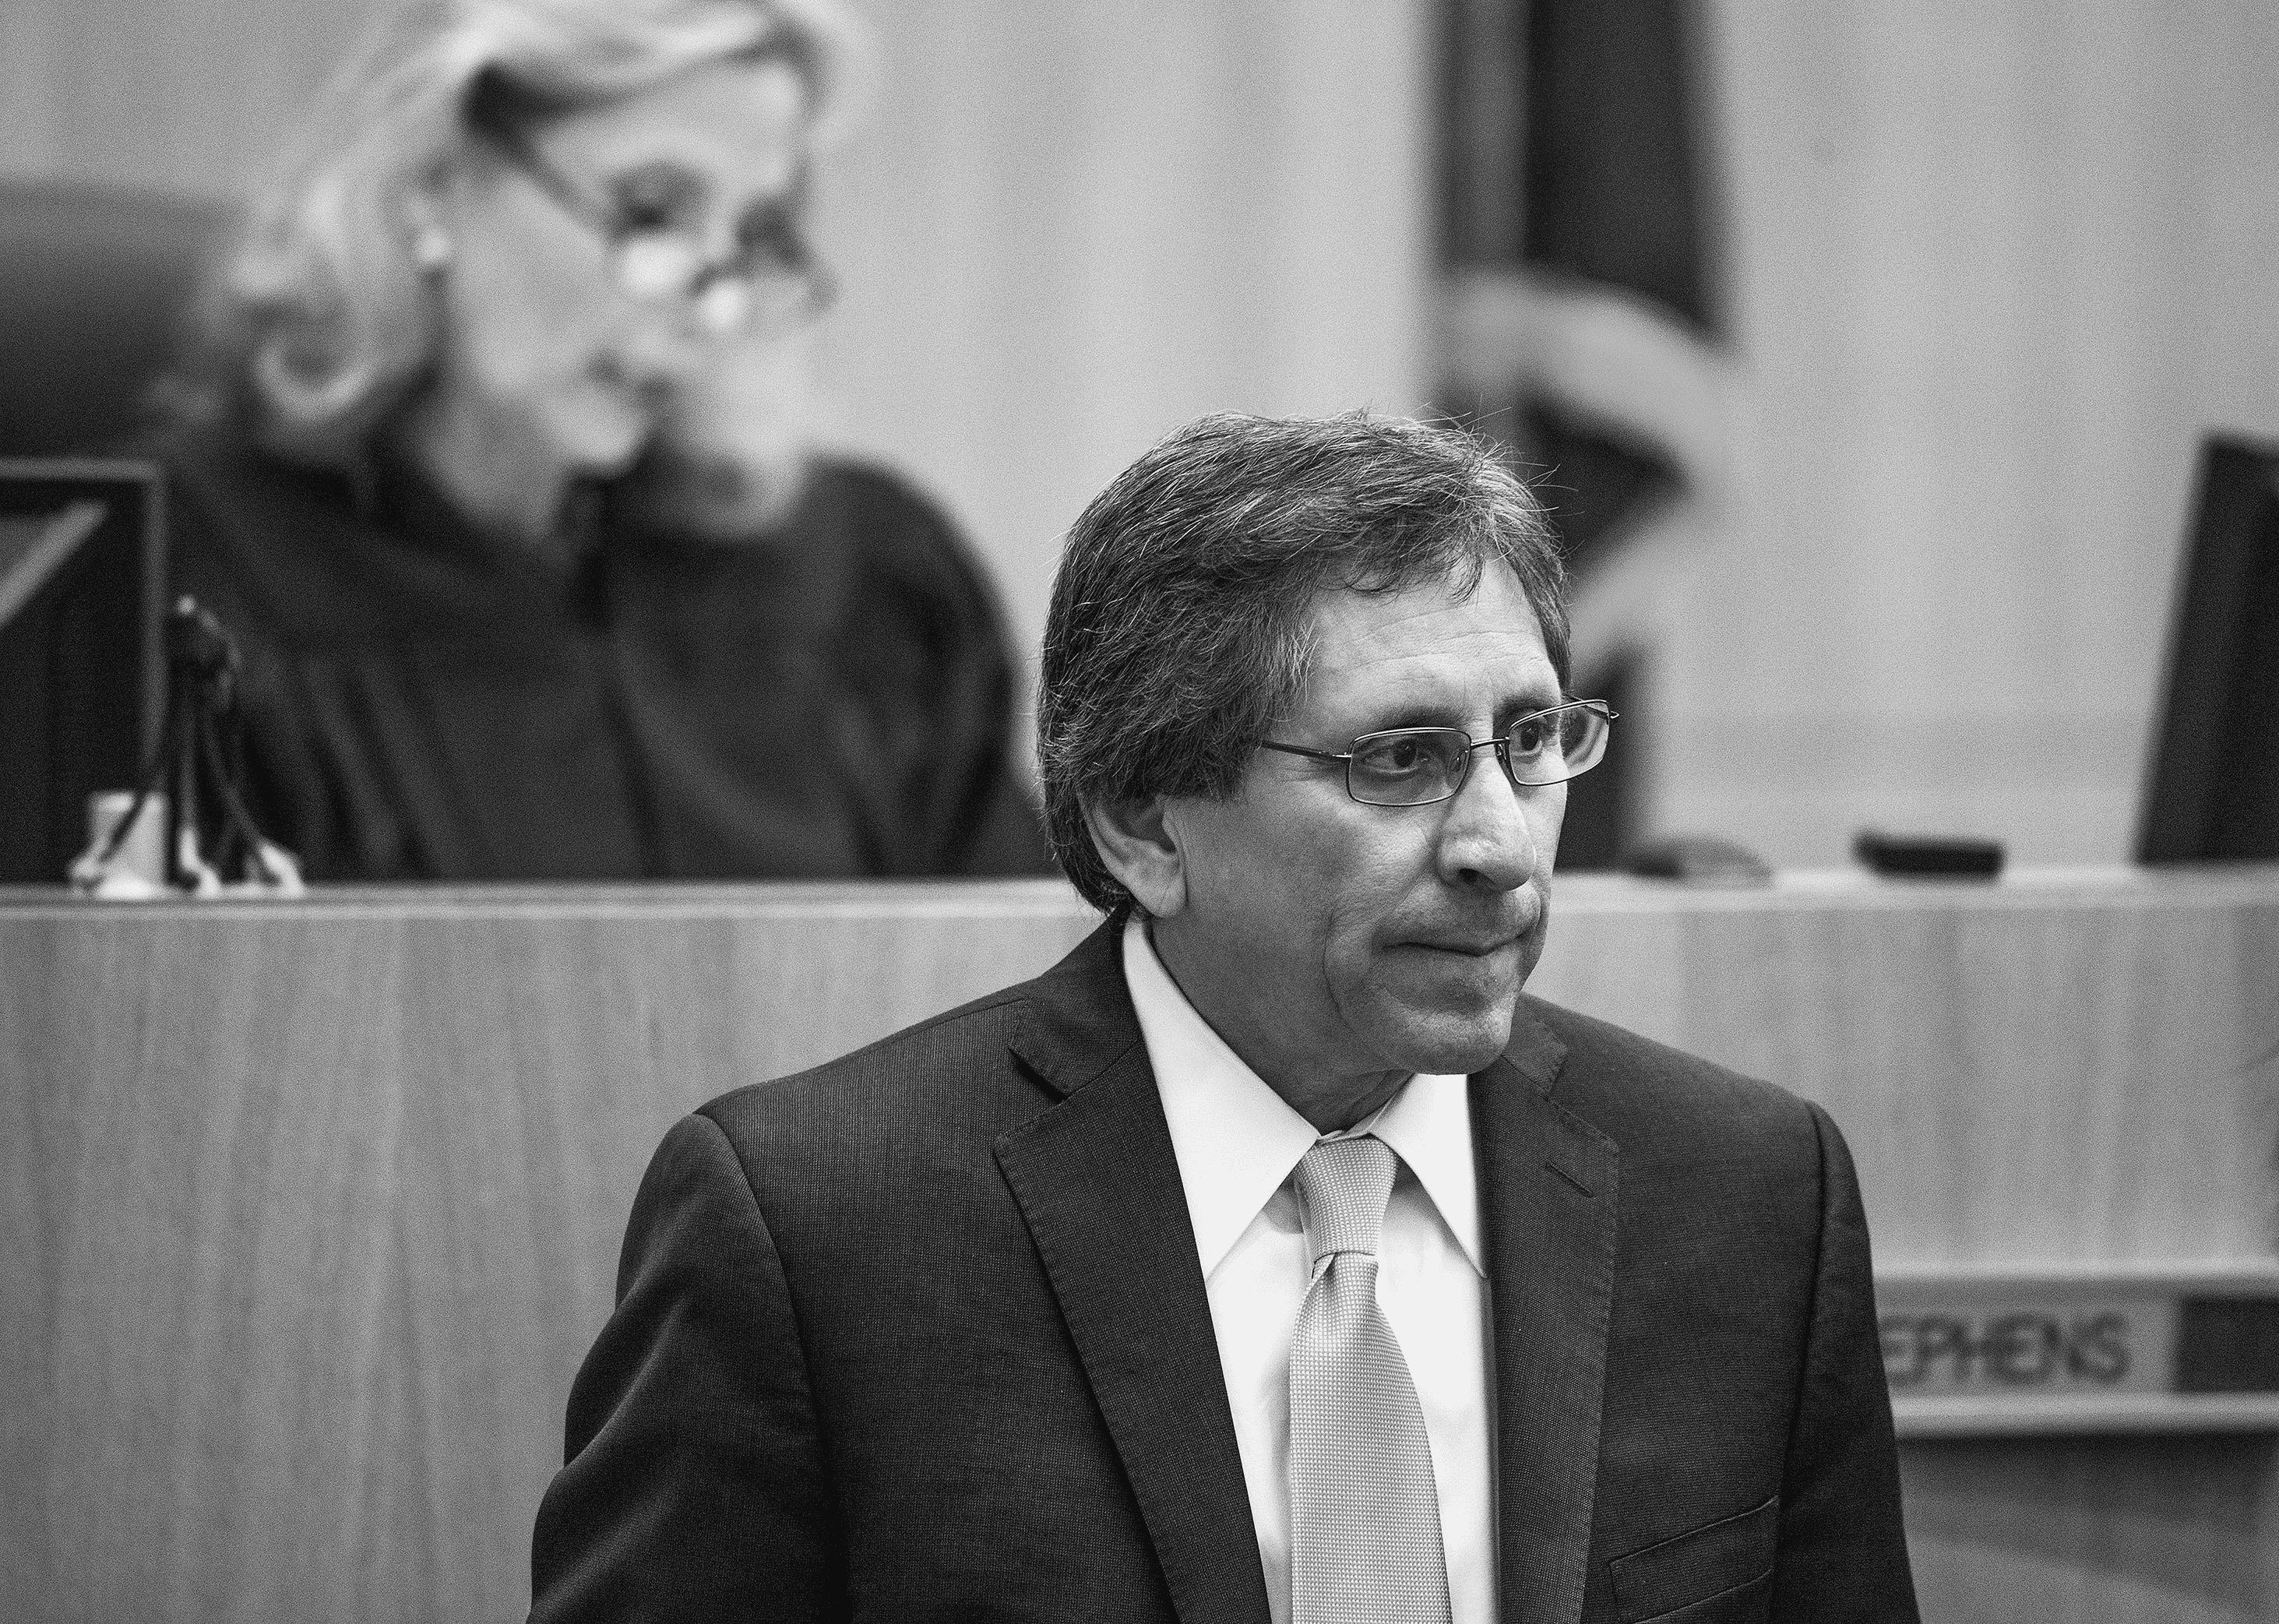 The Jodi Arias murder trial made Maricopa County prosecutor Juan Martinez an international celebrity.